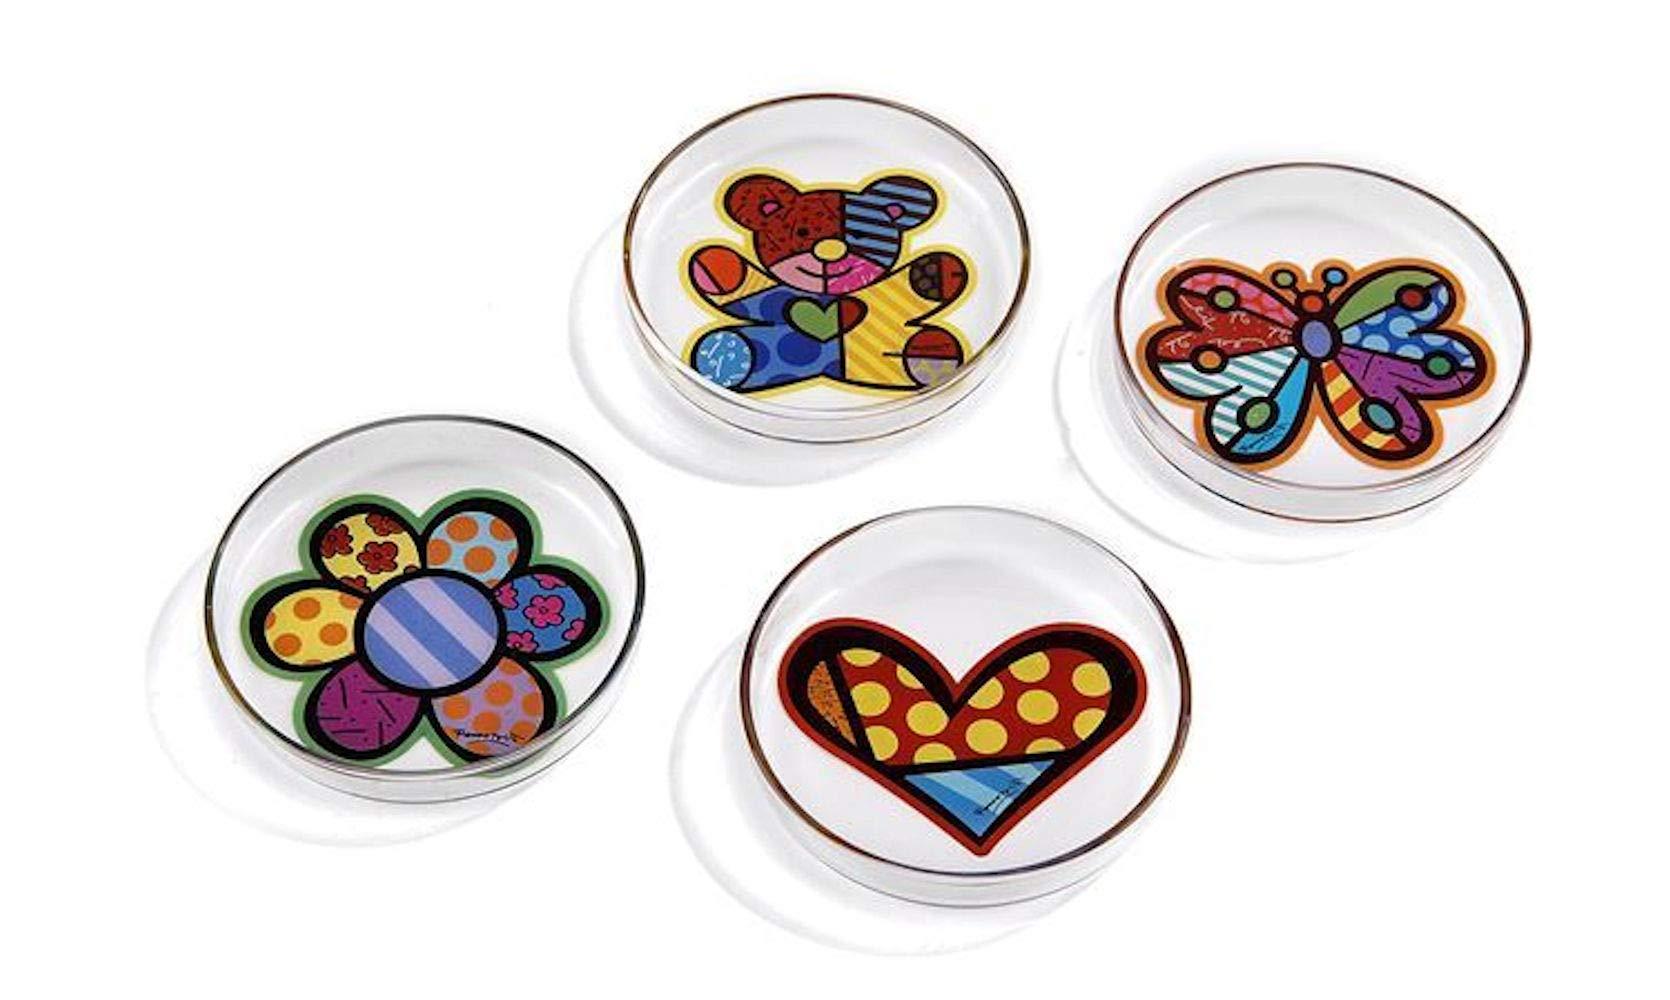 Romero Britto Set of 4 Glass Tea Bag Holders - Flower Teddy Bear, Heart, Butterfly by Romero Britto